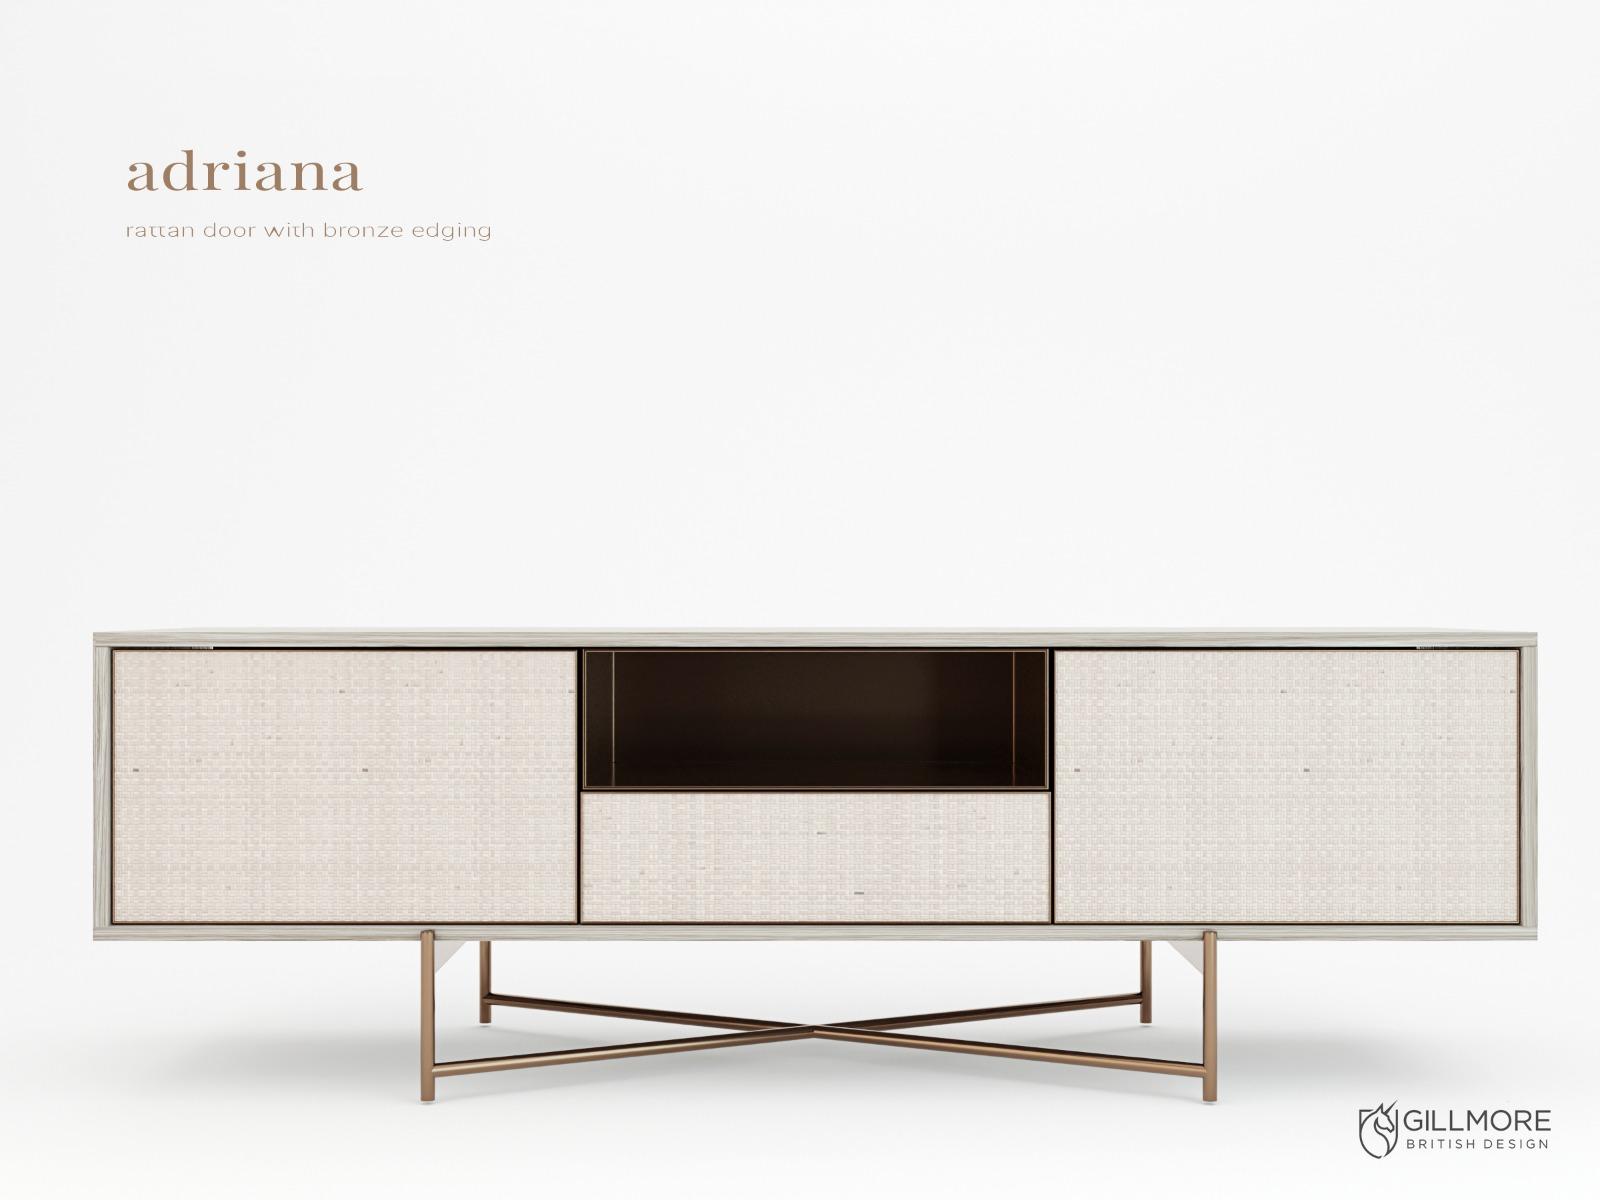 Adriana collection by Gillmore © GillmoreSPACE Ltd